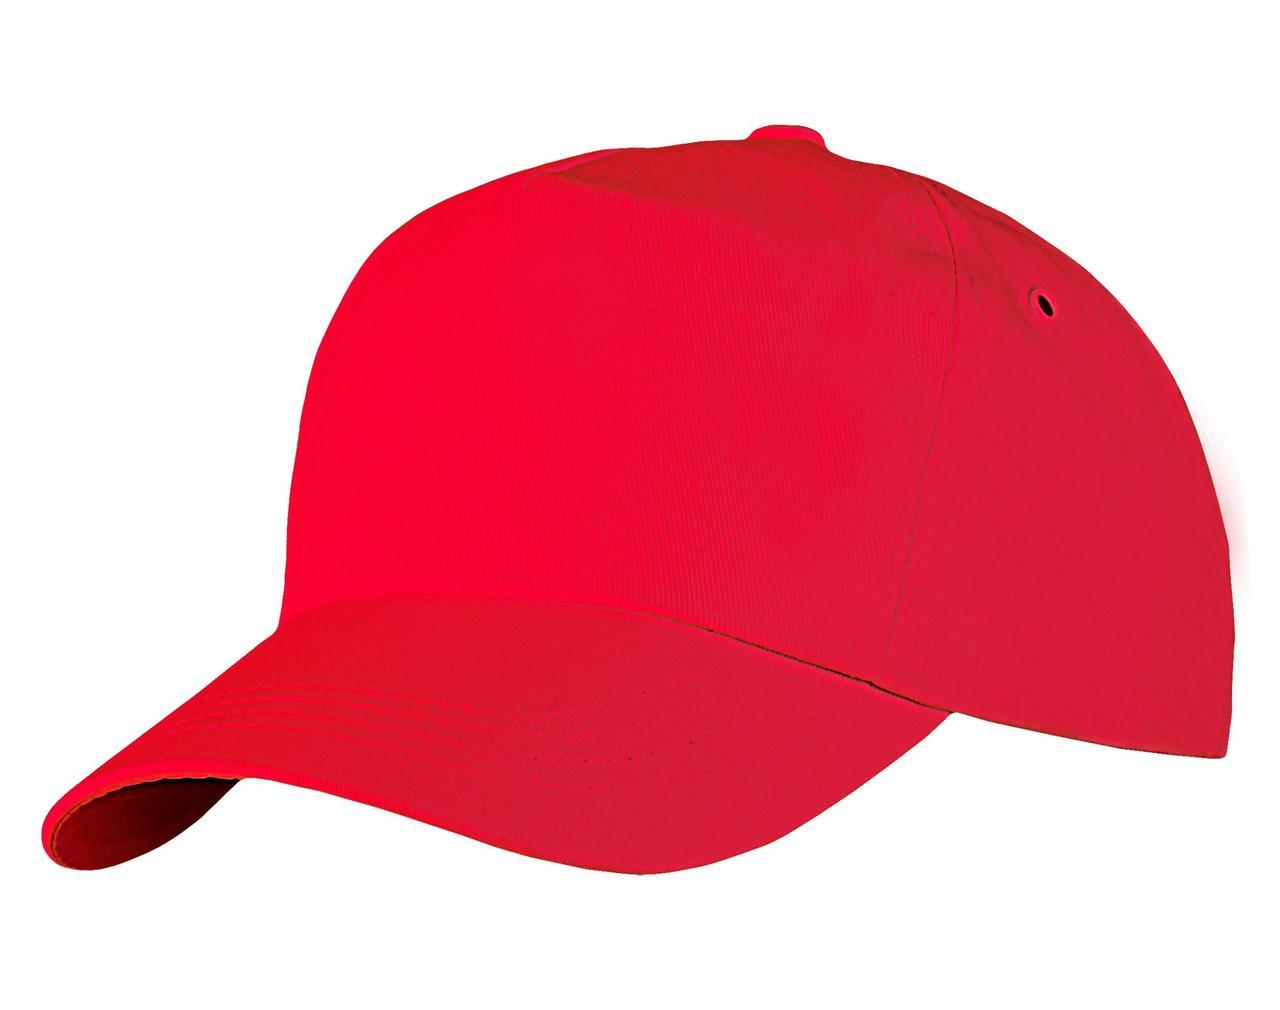 Бейсболка Unit Promo, красная (артикул 1846.50)